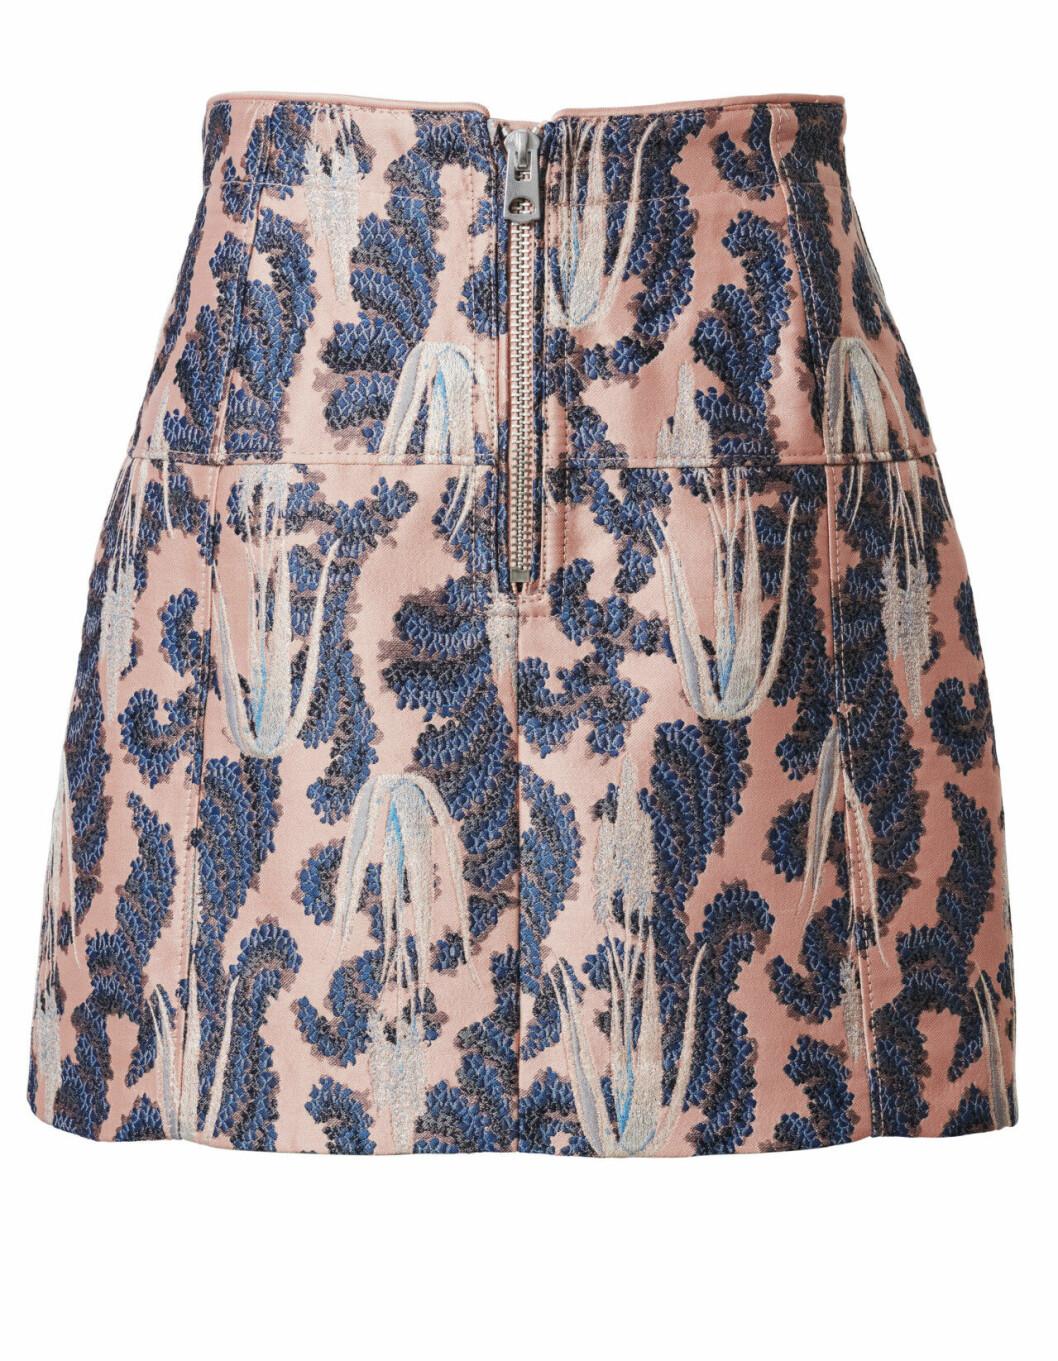 H&M Conscious Exclusive 2019 mönstrad kjol med dragkedja